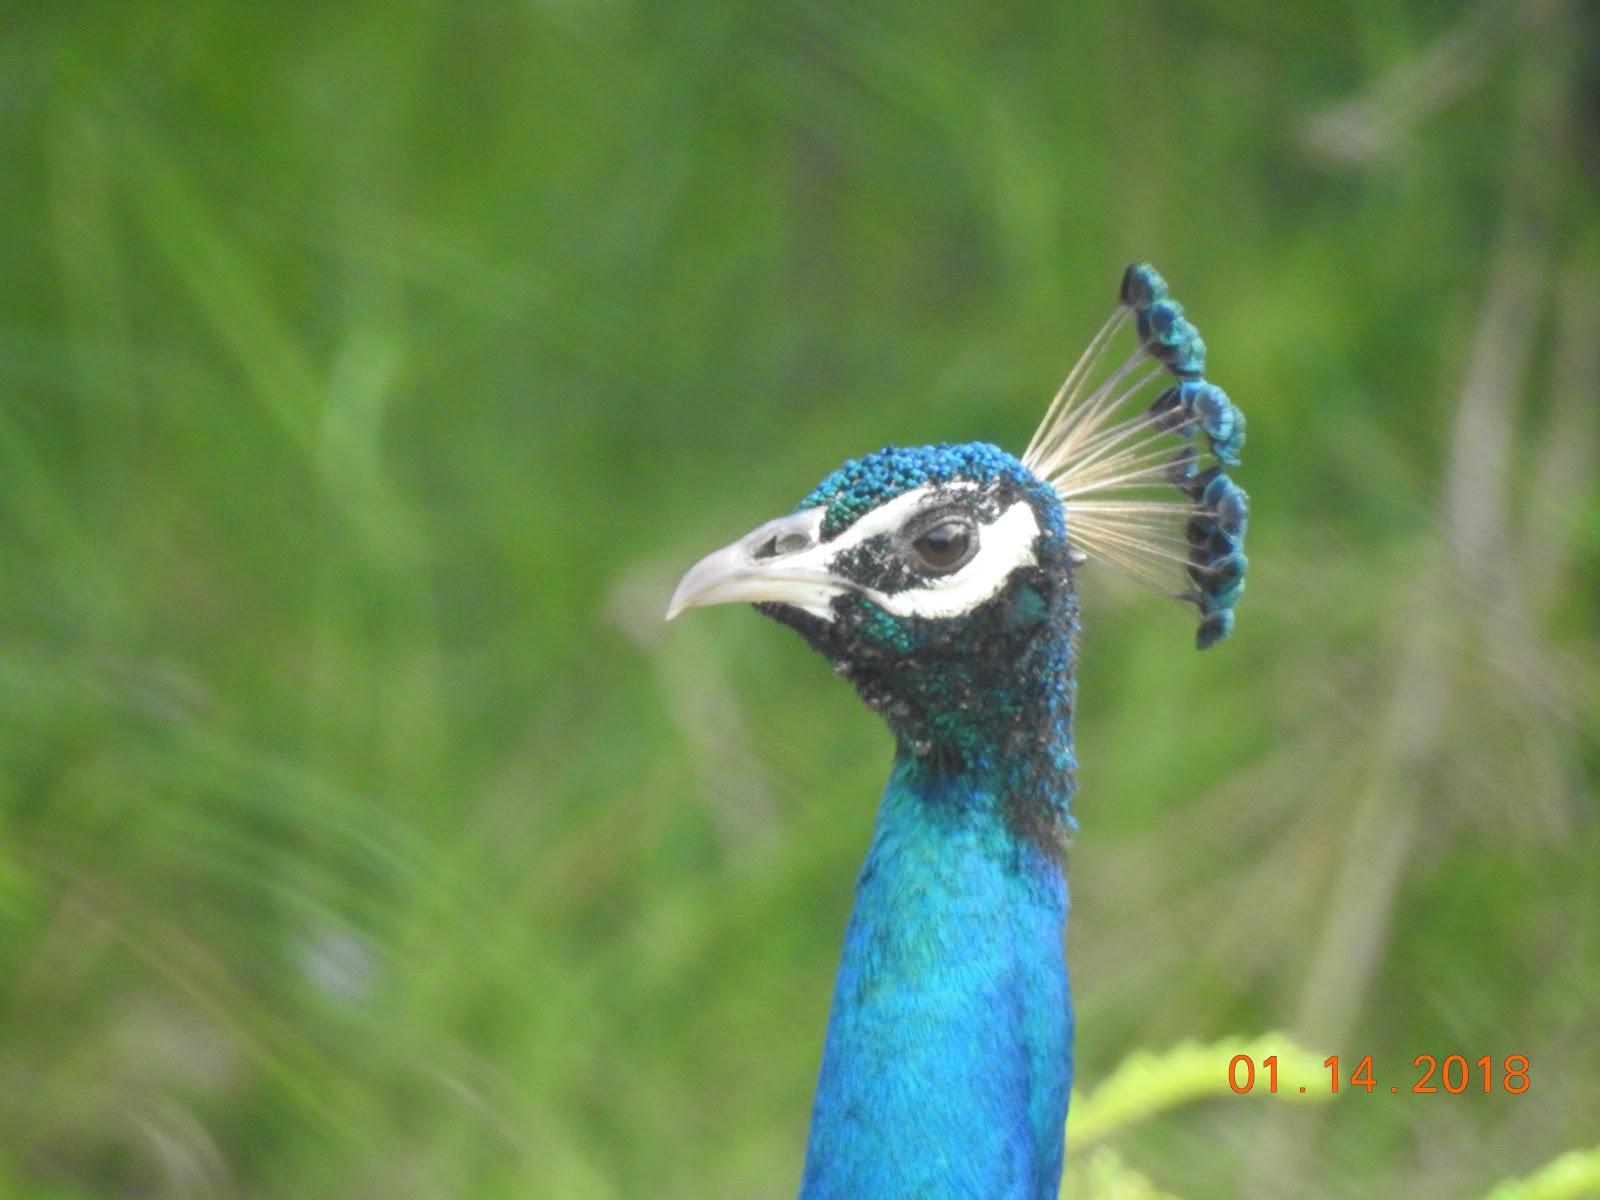 invite-to-paradise-sri-lanka-maldives-holiday-specialists-nutan-vidyut-patel-peacock.jpg